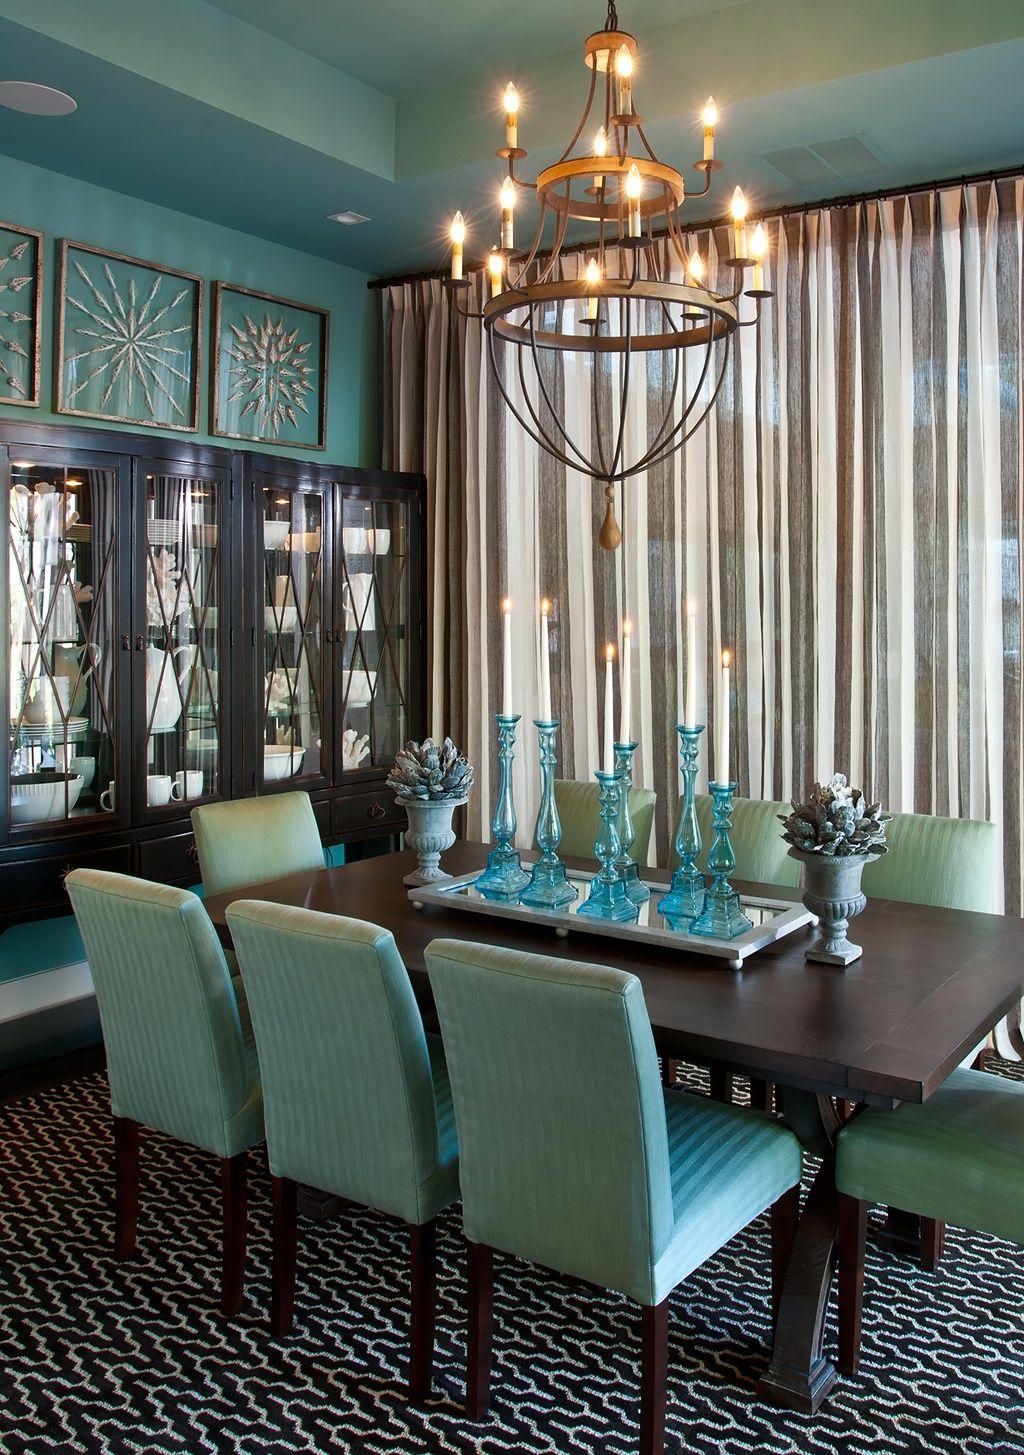 Azul turquesa para una cocina isla | Deco | Pinterest | Phoenix and Room